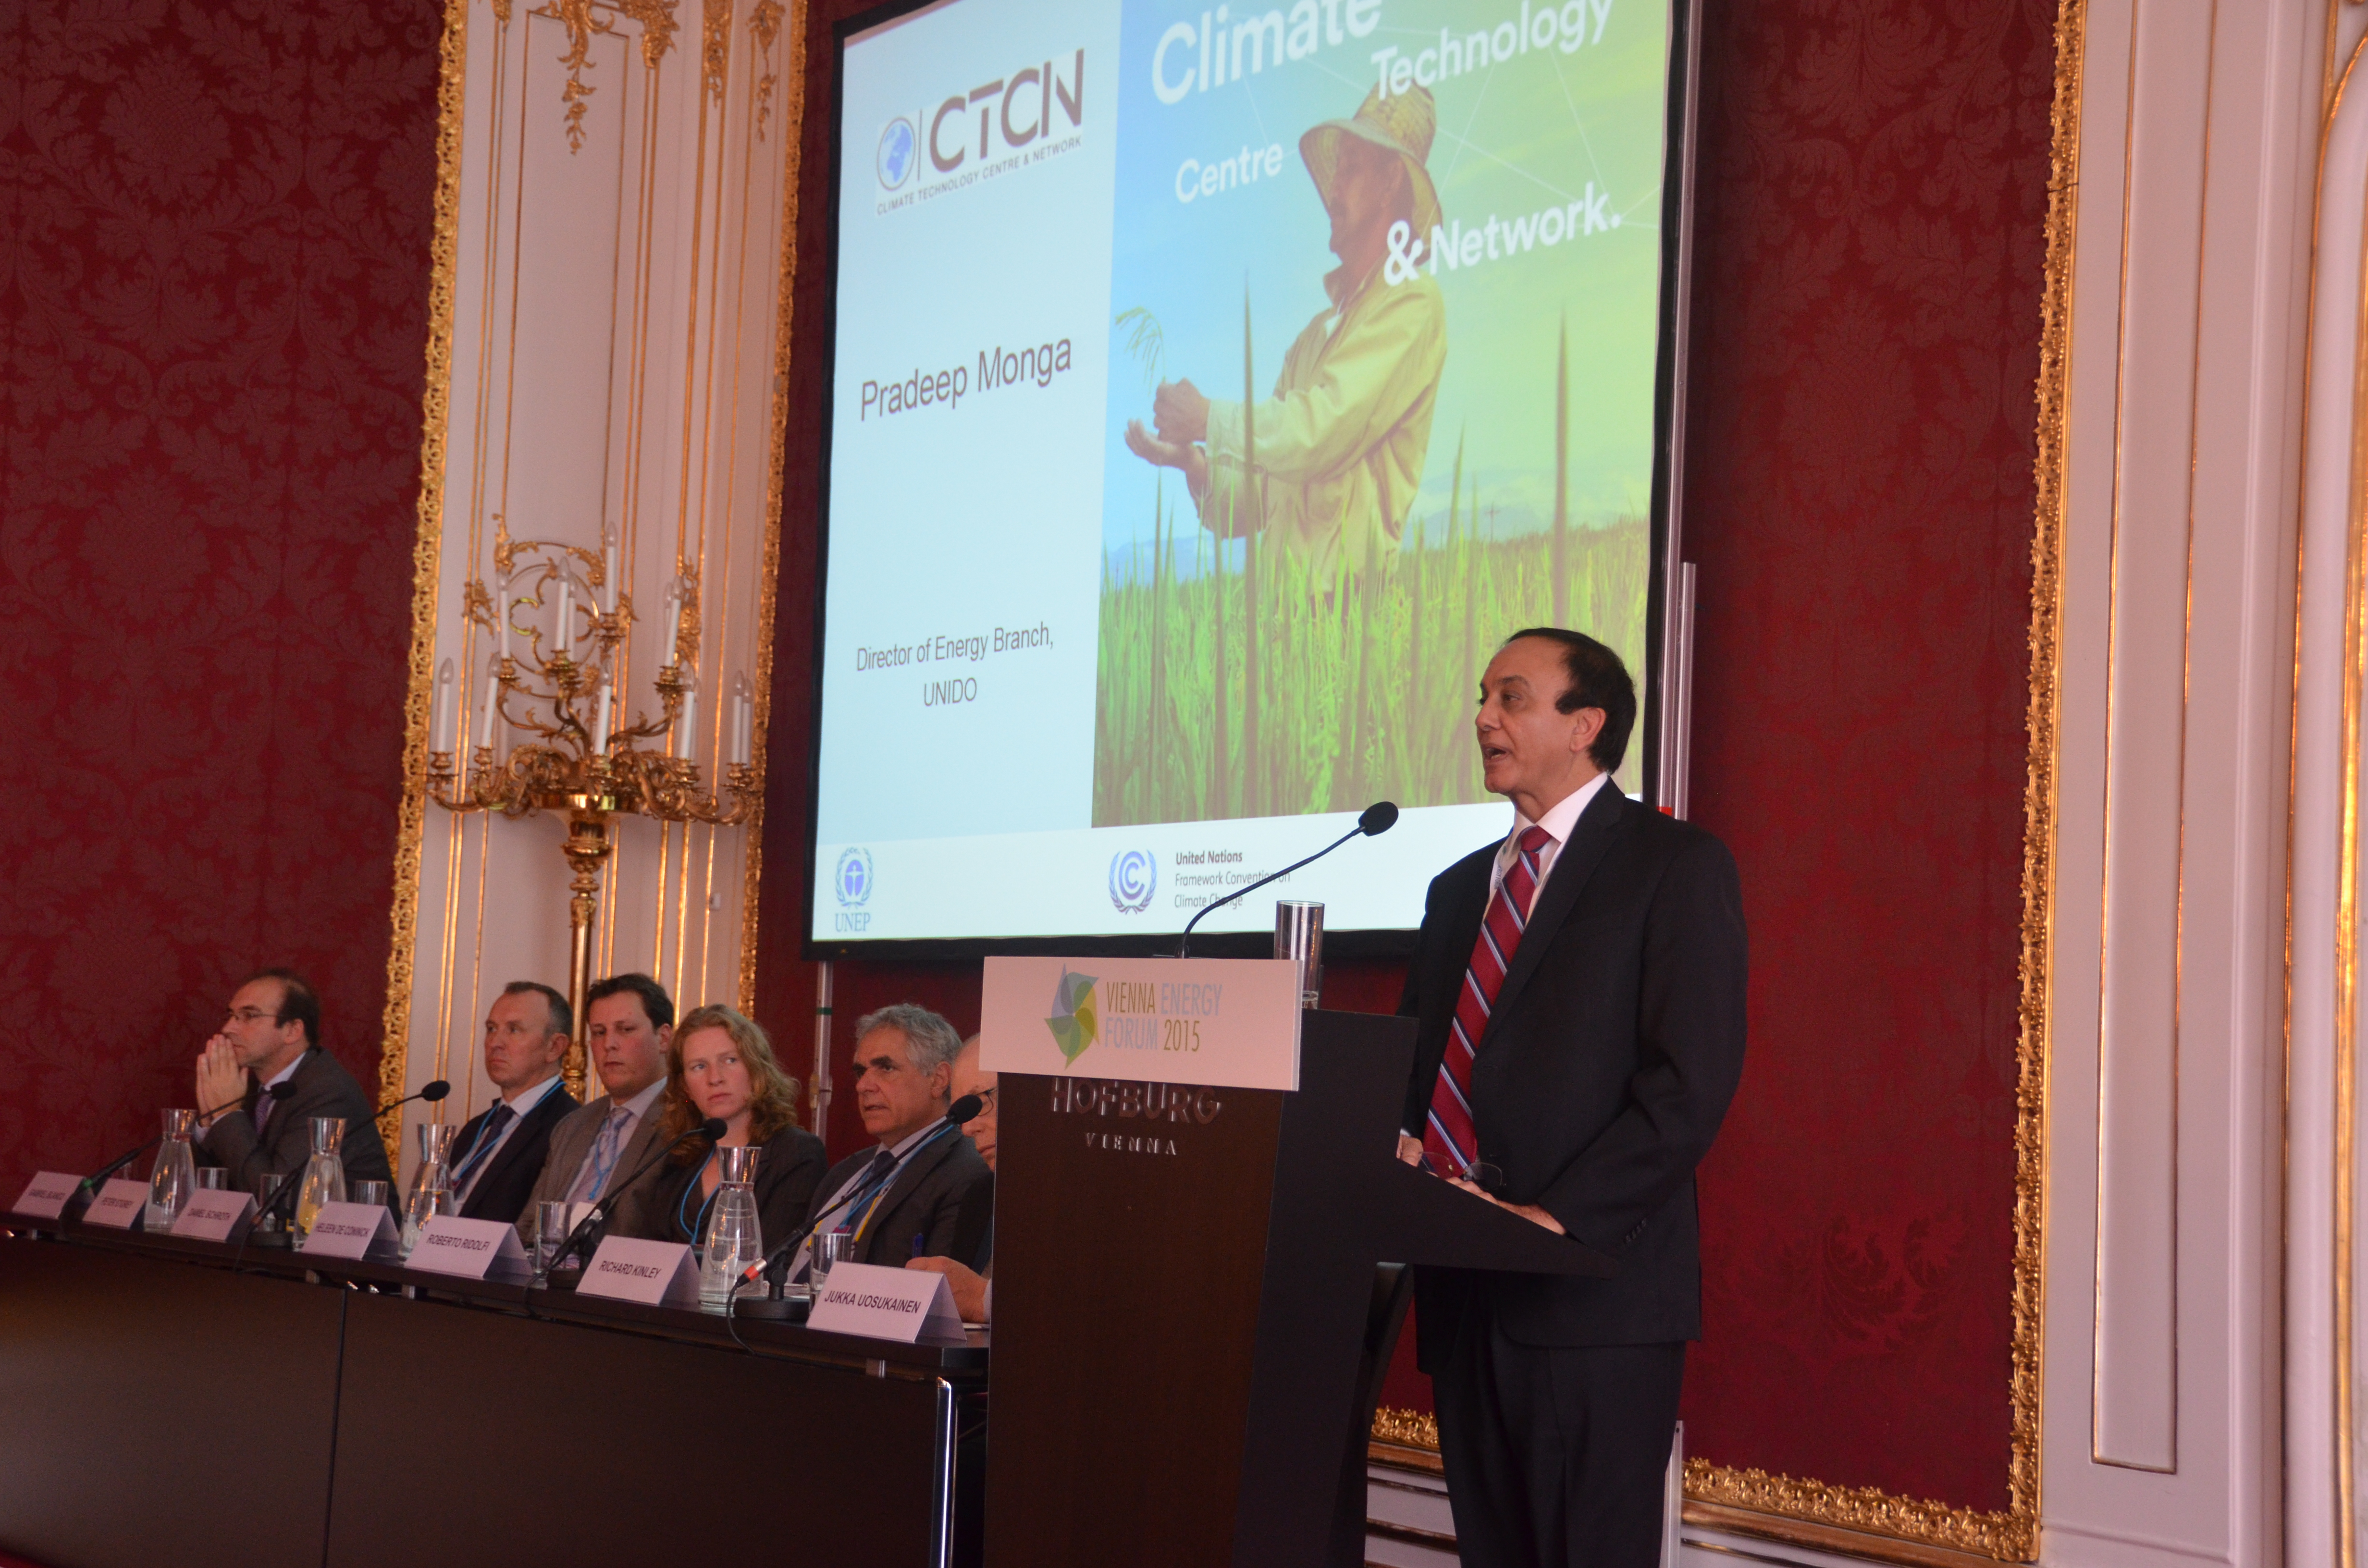 Vienna_Energy_Forum_2015 185.JPG